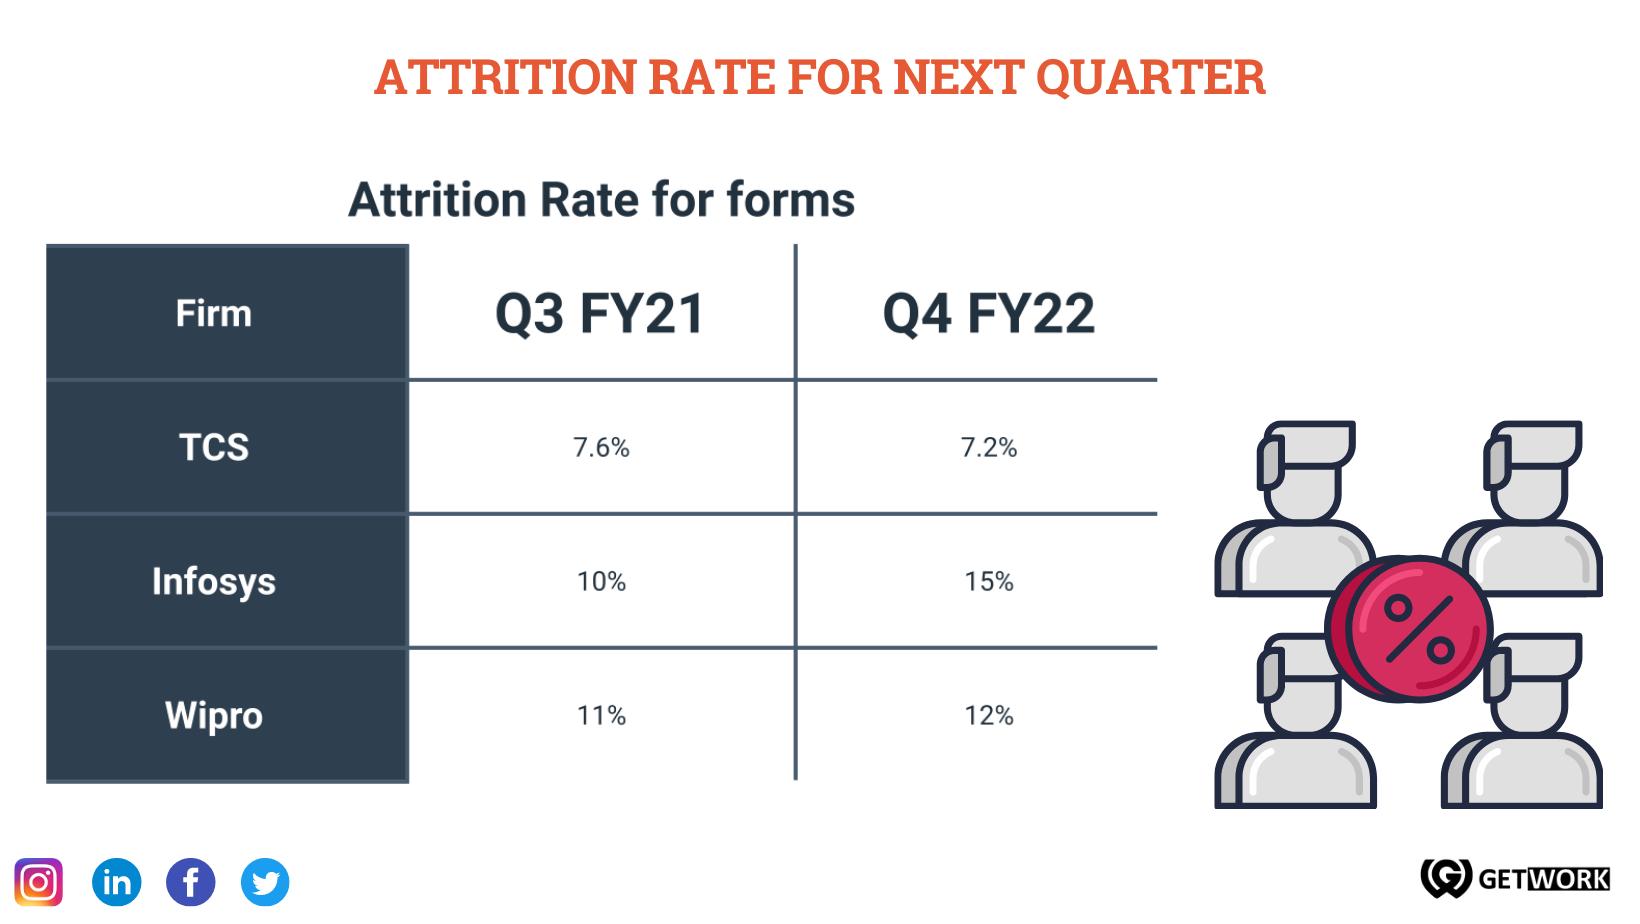 Attrition Rate Next Quarter